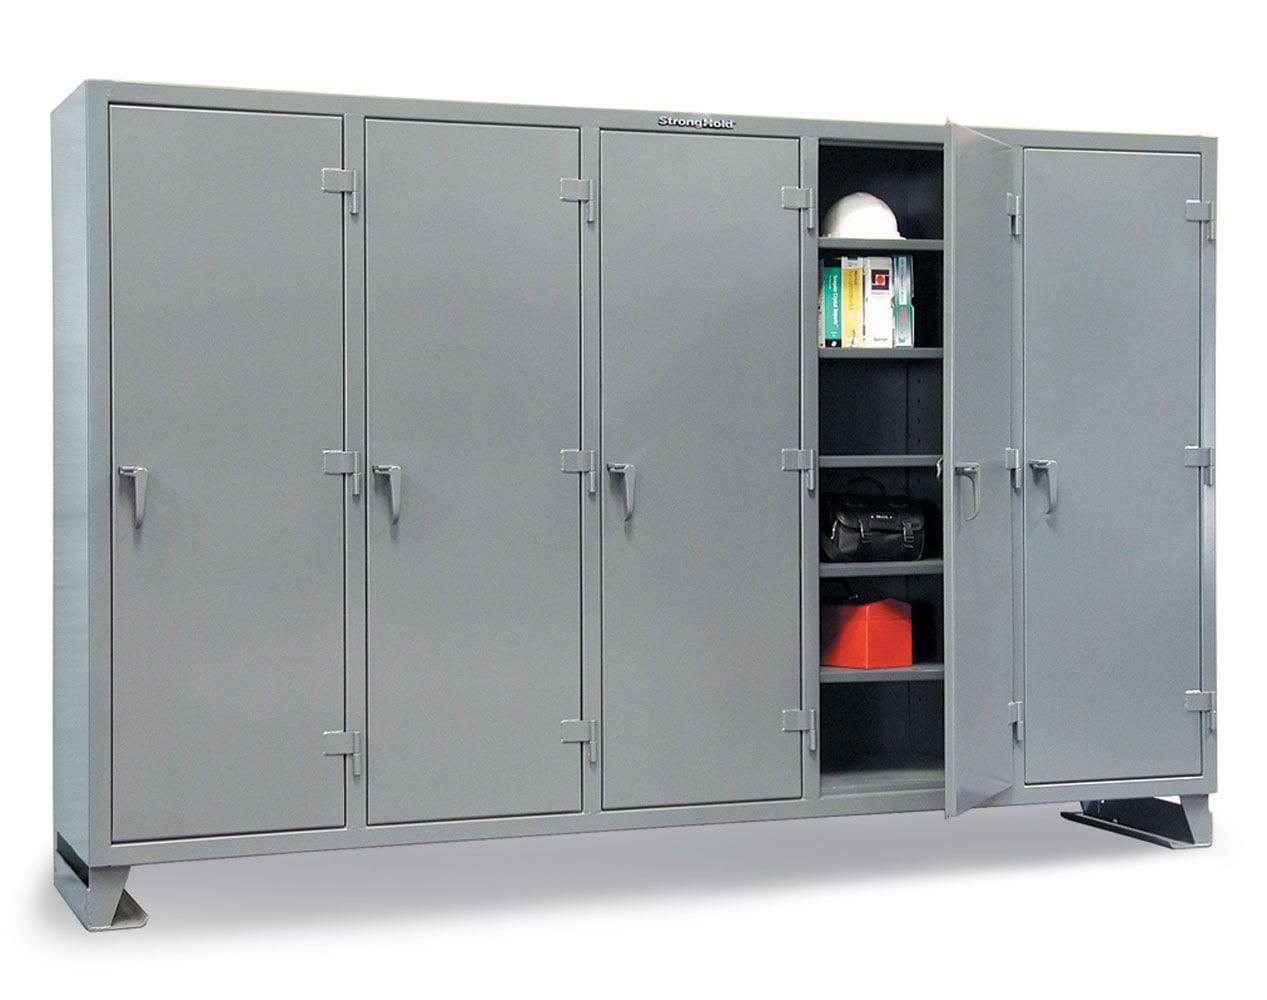 Extra Heavy Duty 12 GA Multi-Shift Cabinet with 15 Shelves – 72 In. W x 24 In. D x 78 In. H